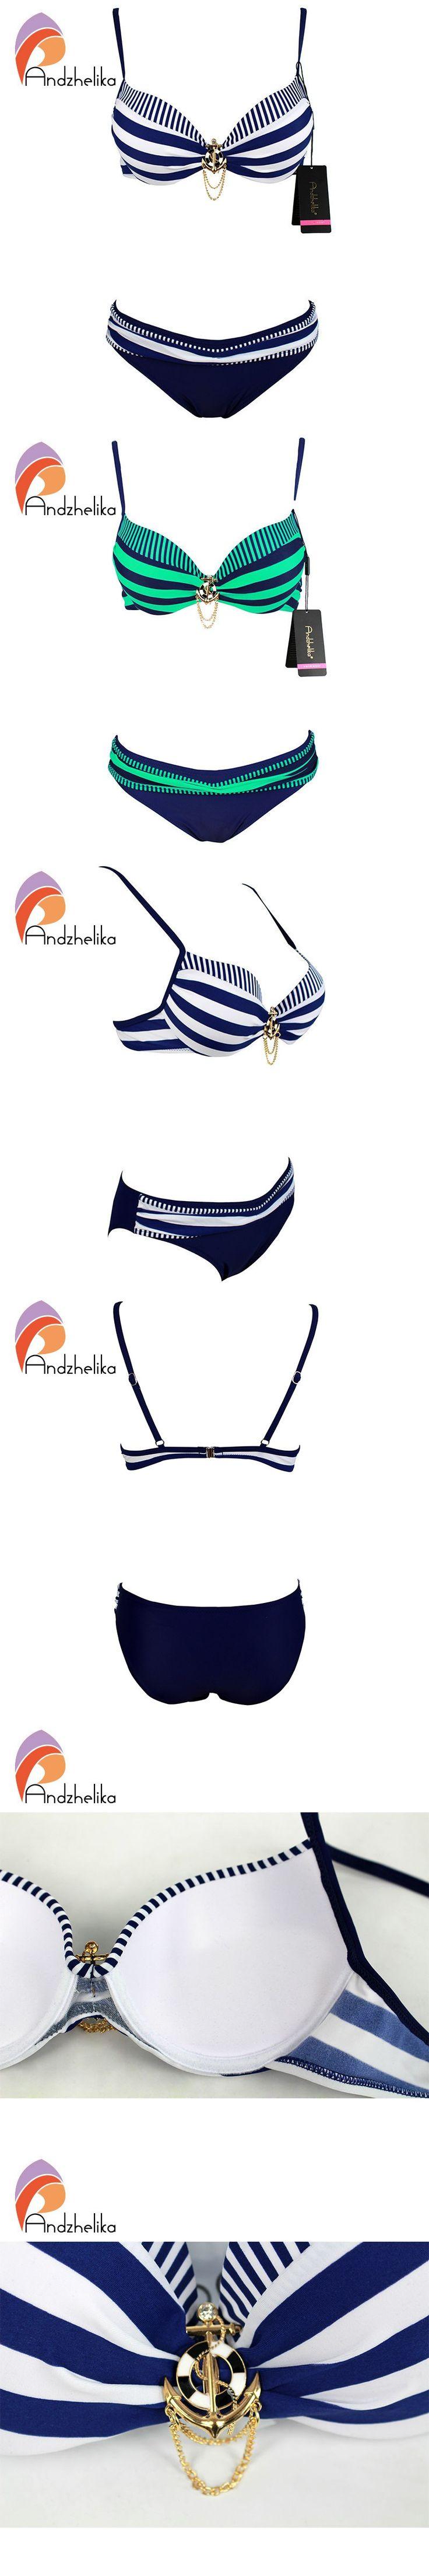 Andzhelika Bikini 2016 New Push Up Swimwear Retro Navy BLue Black White Striped Anchors Bathing Suit Bikini Set Monokinis AK1648 $21.78